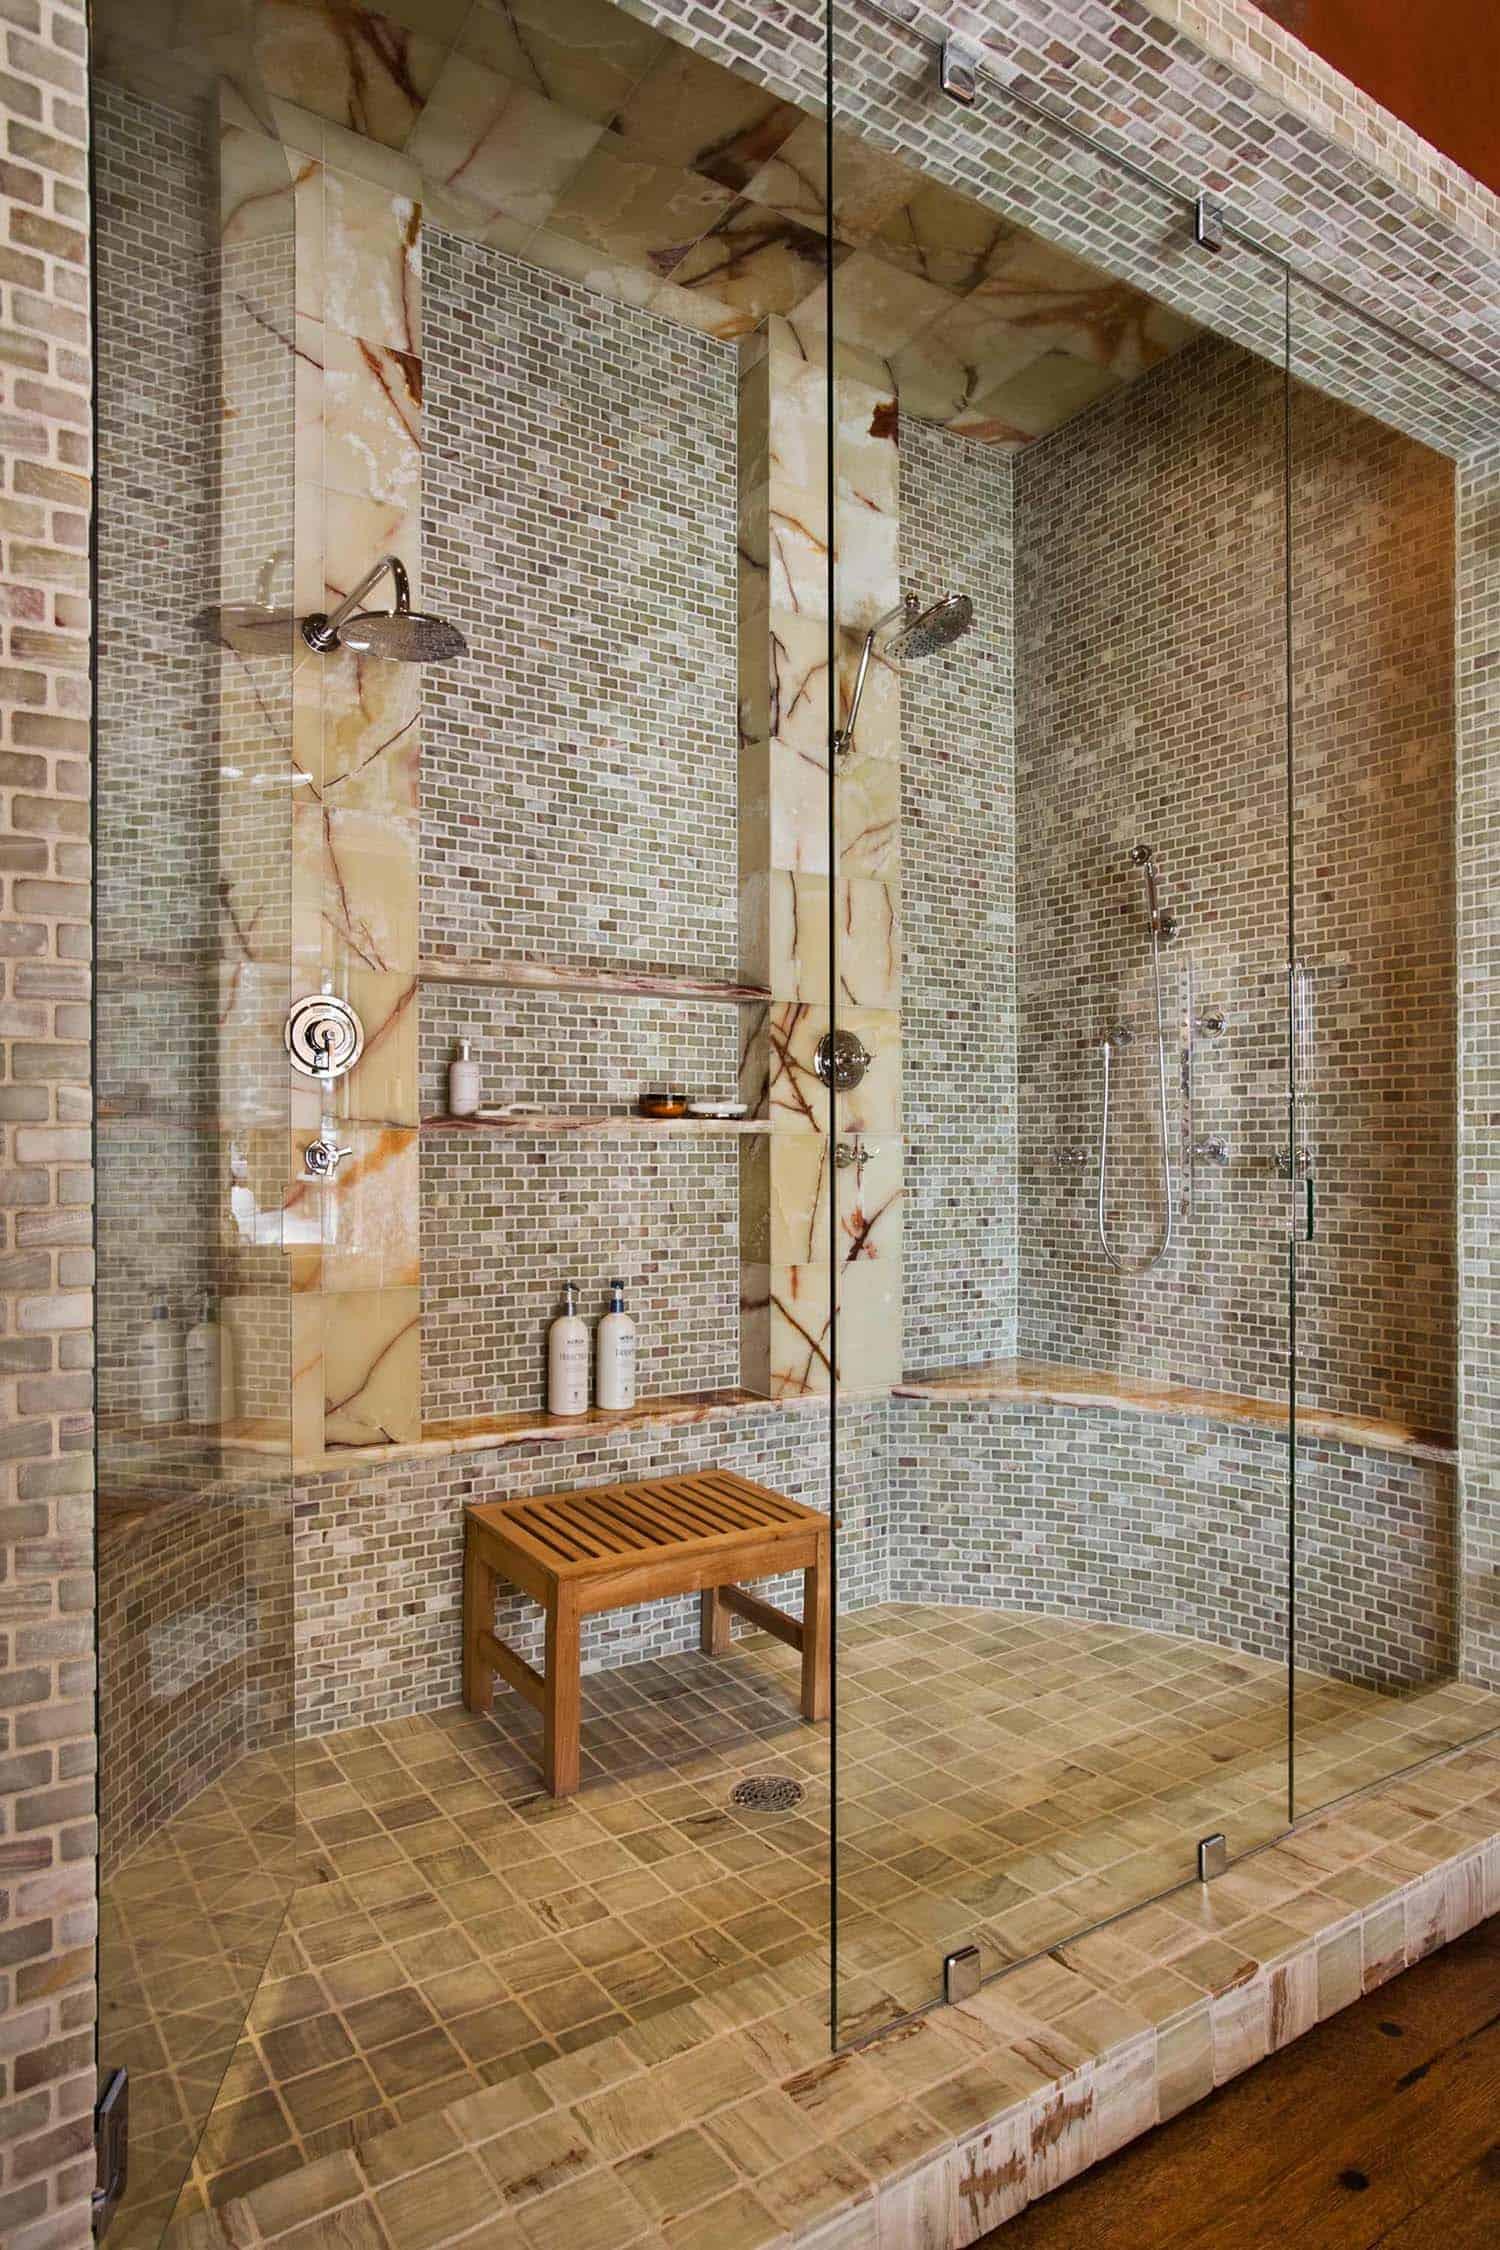 Modern-Rustic Mountain Home-Locati Architects-21-1 Kindesign